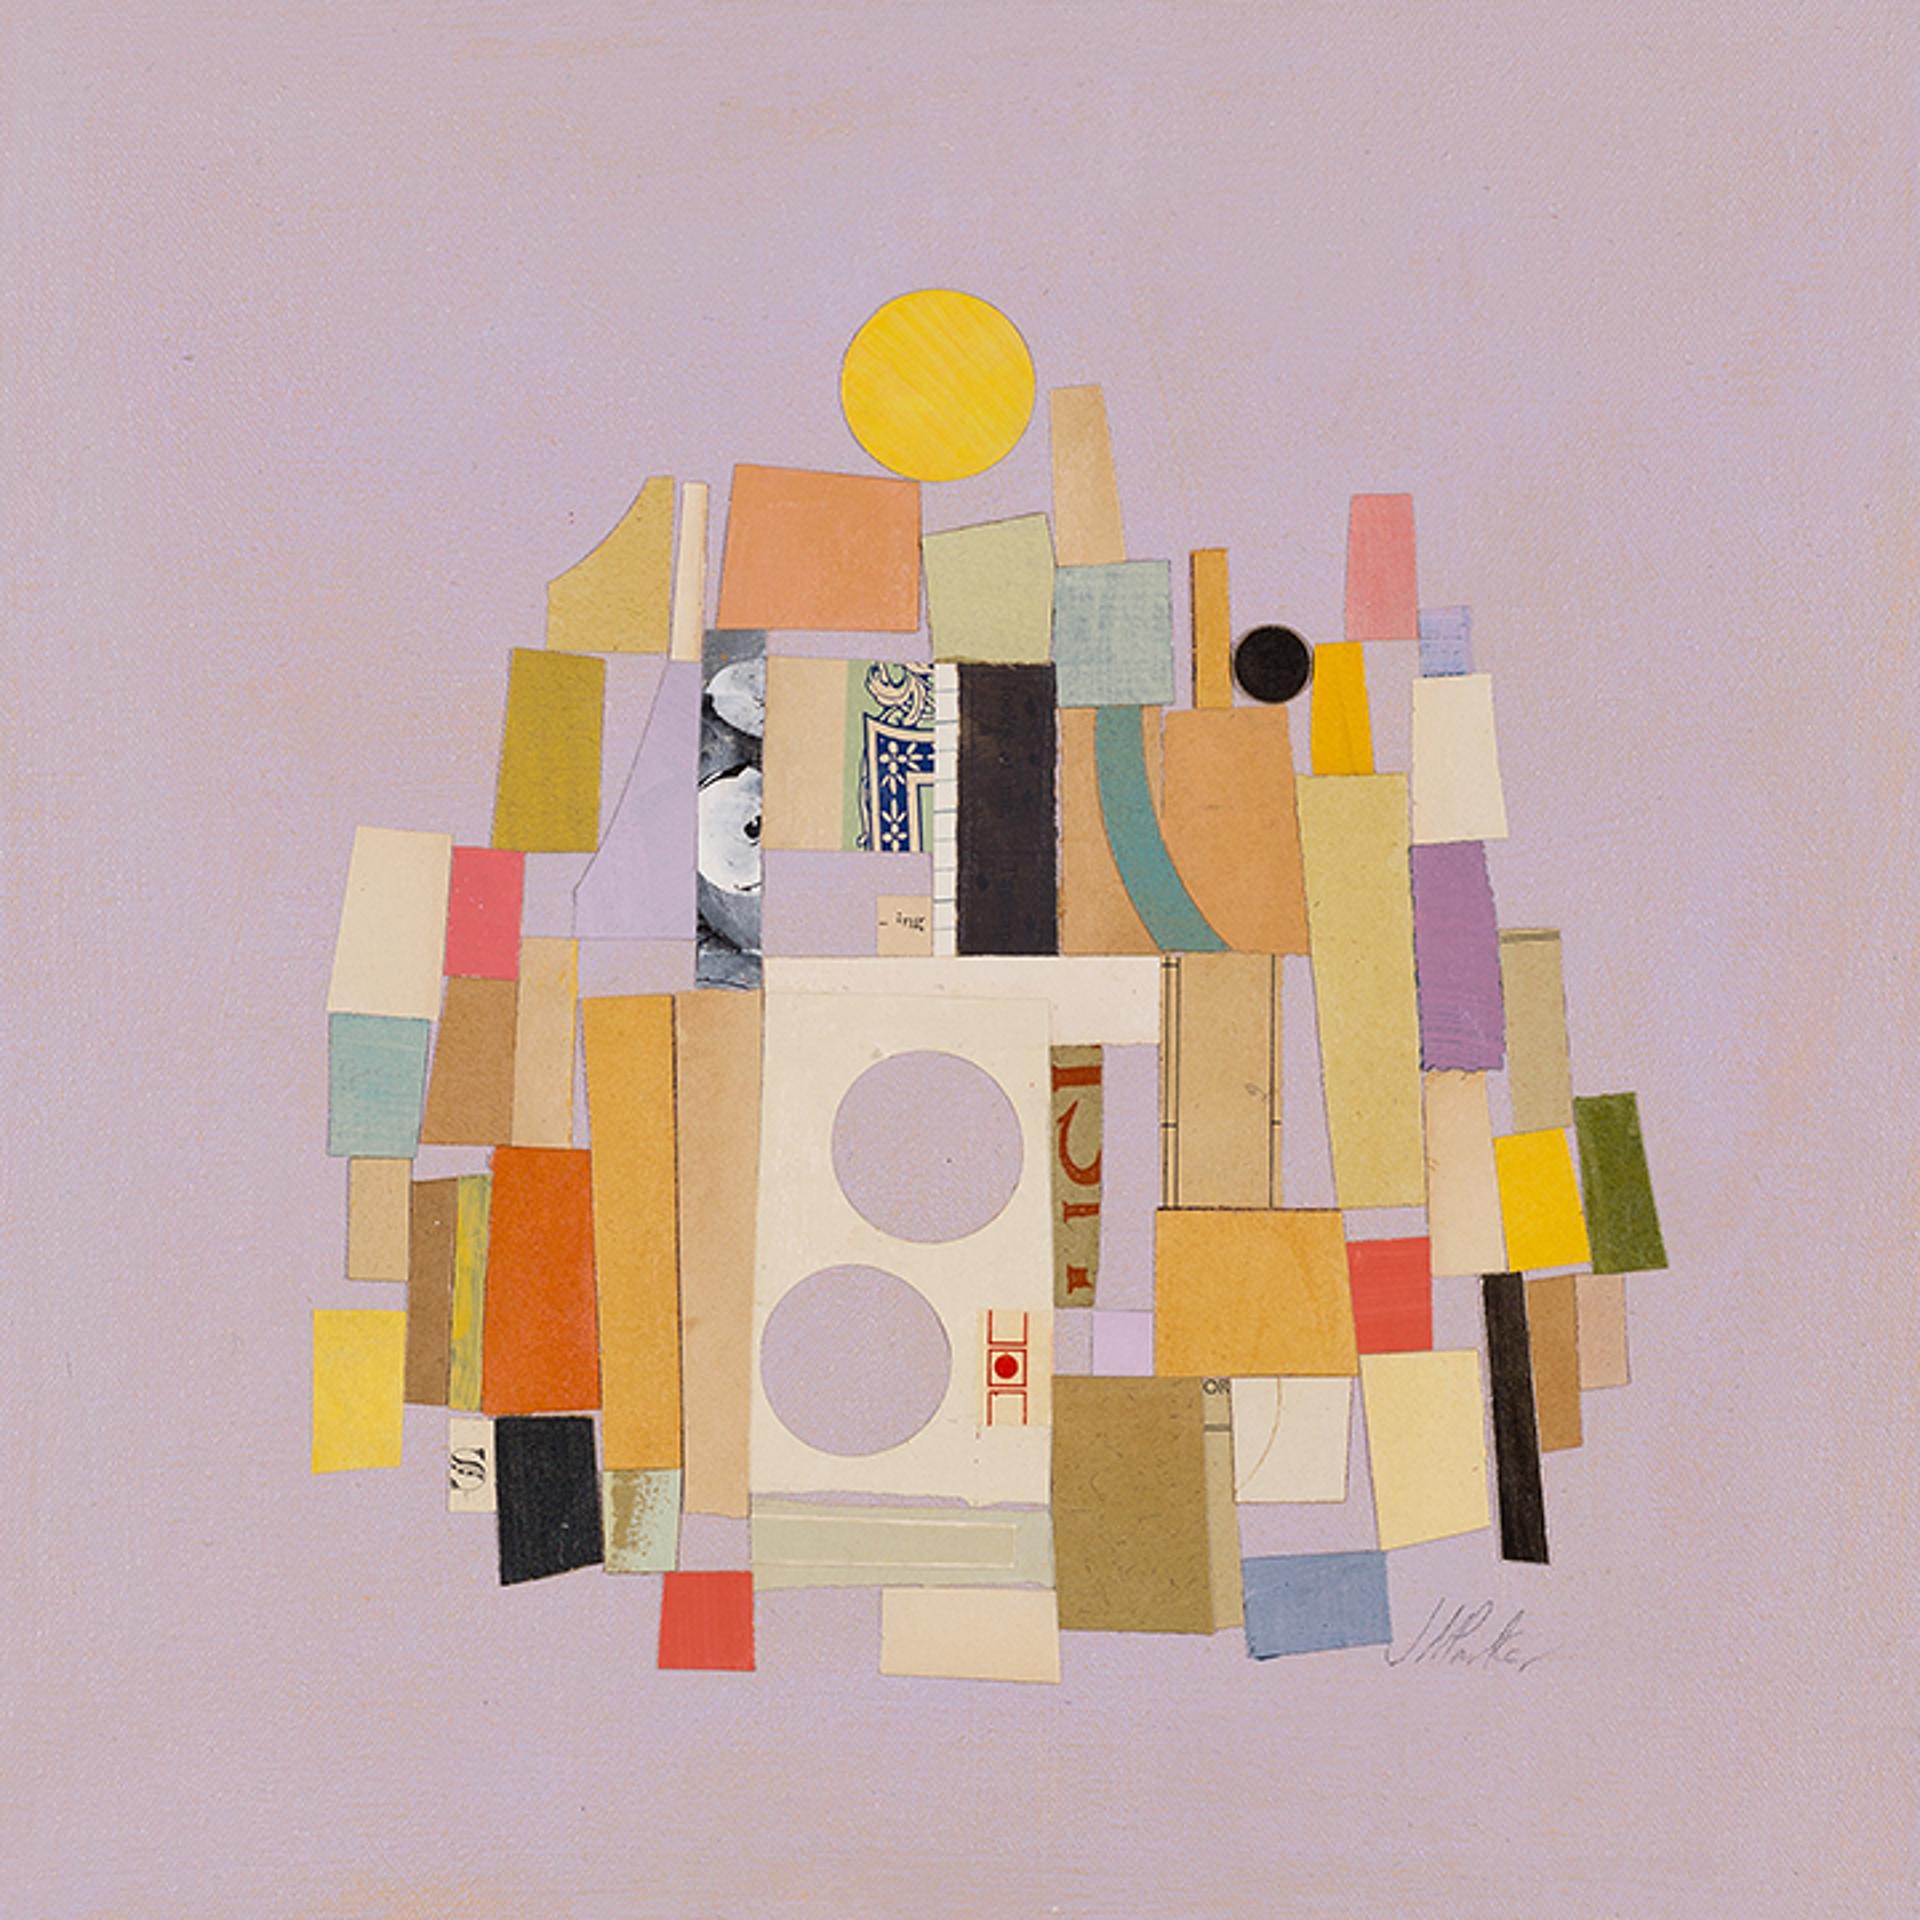 Building Blocks (Tower of Plenty) by Jacqueline Dee Parker